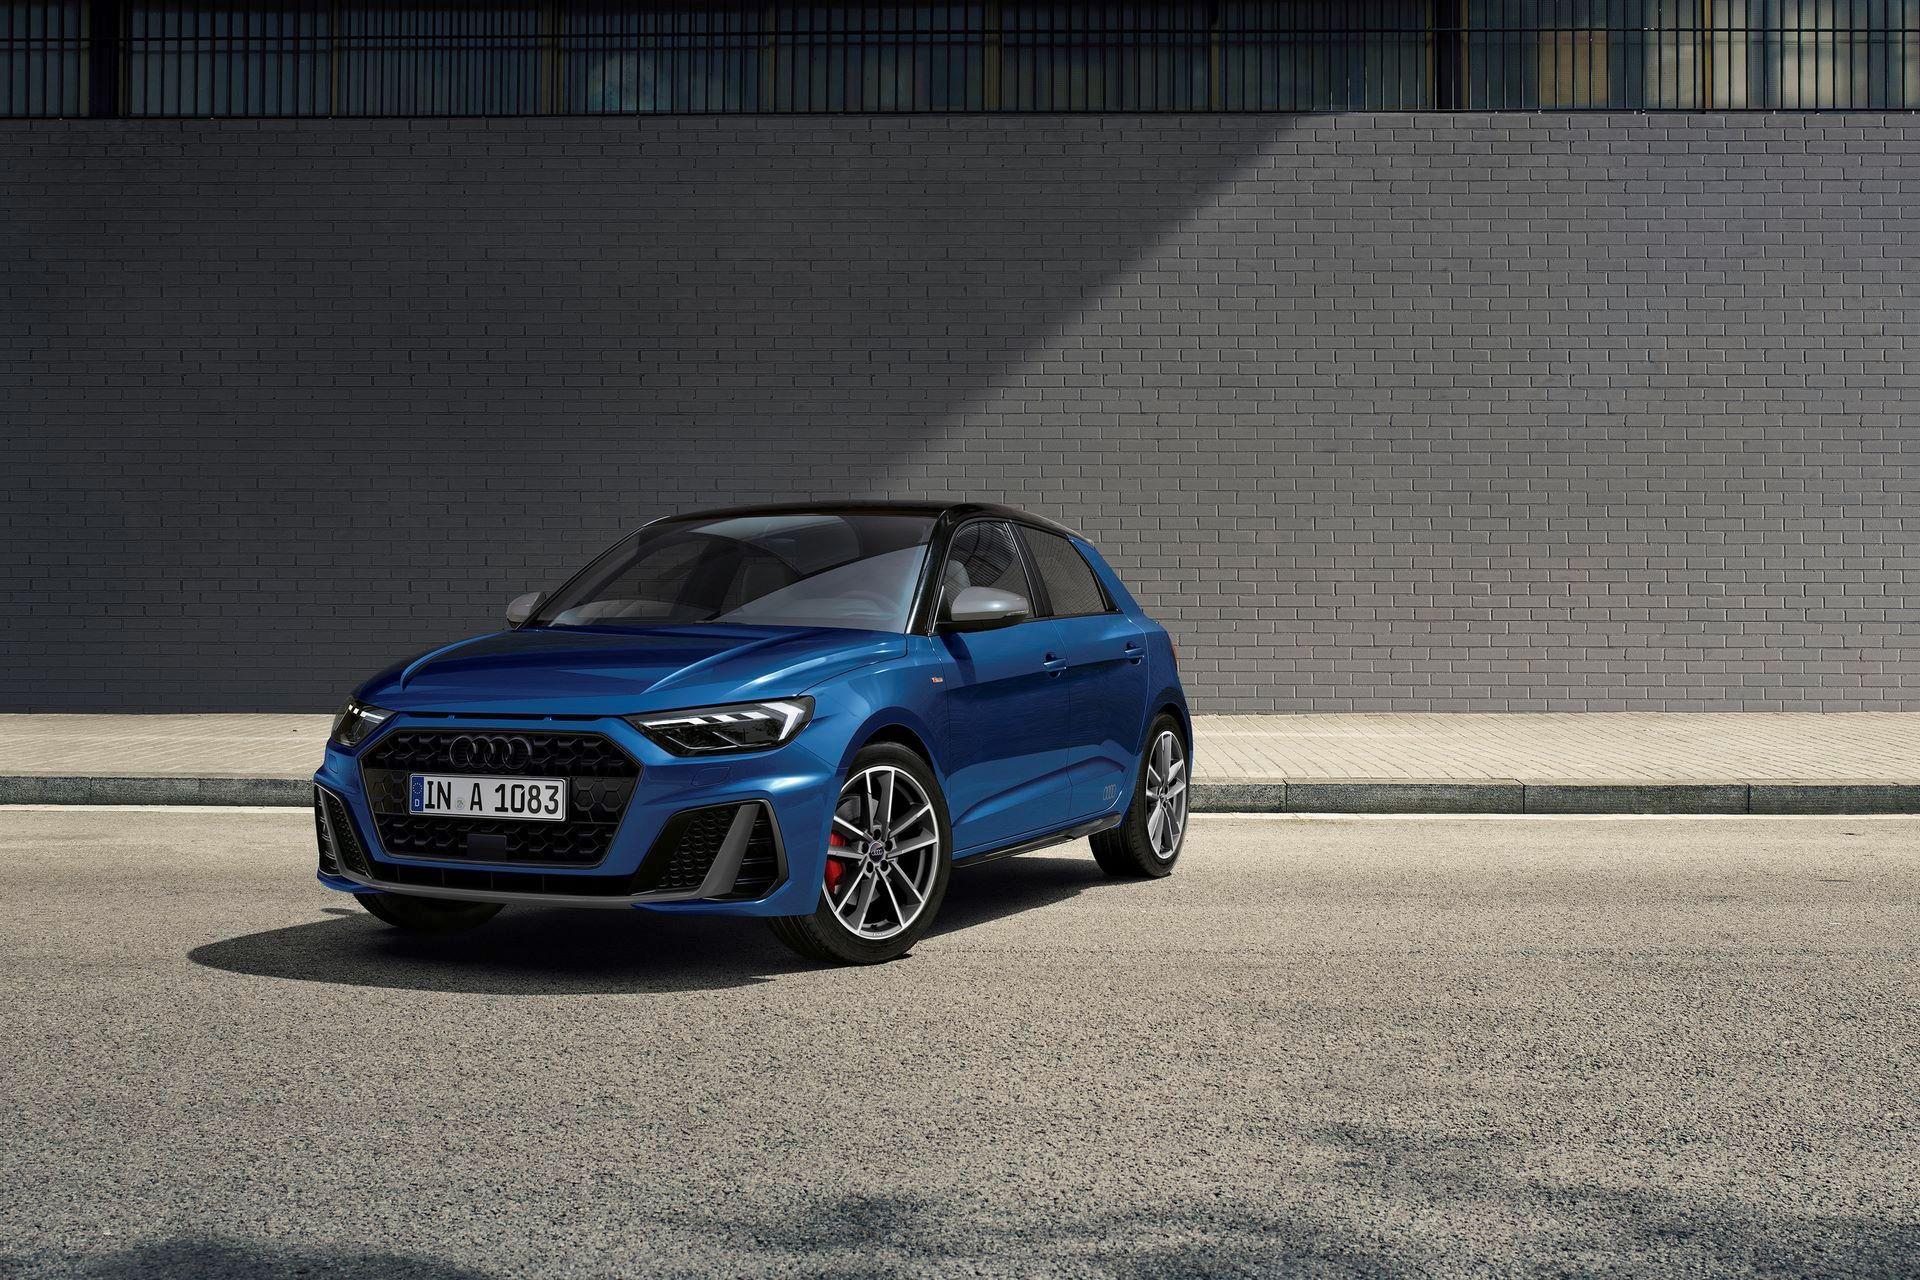 Audi-A4-A5-Q7-Q8-Competition-And-Competition-Plus-Trims-3